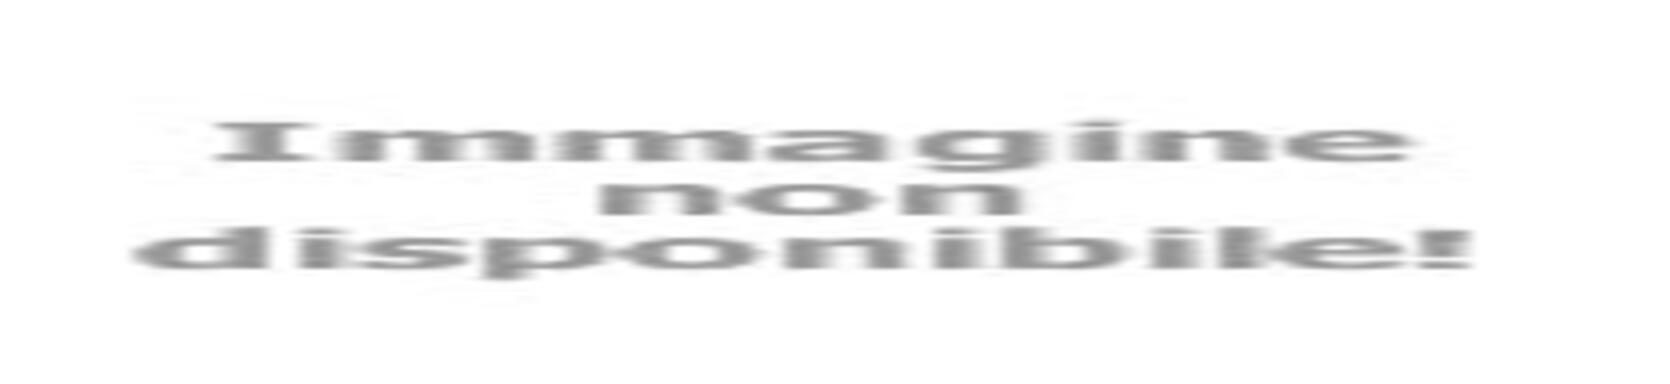 basketriminicrabs it 6-2725-video-eybl-u14-ii-tappa-intervista-rubin-stefanov 005